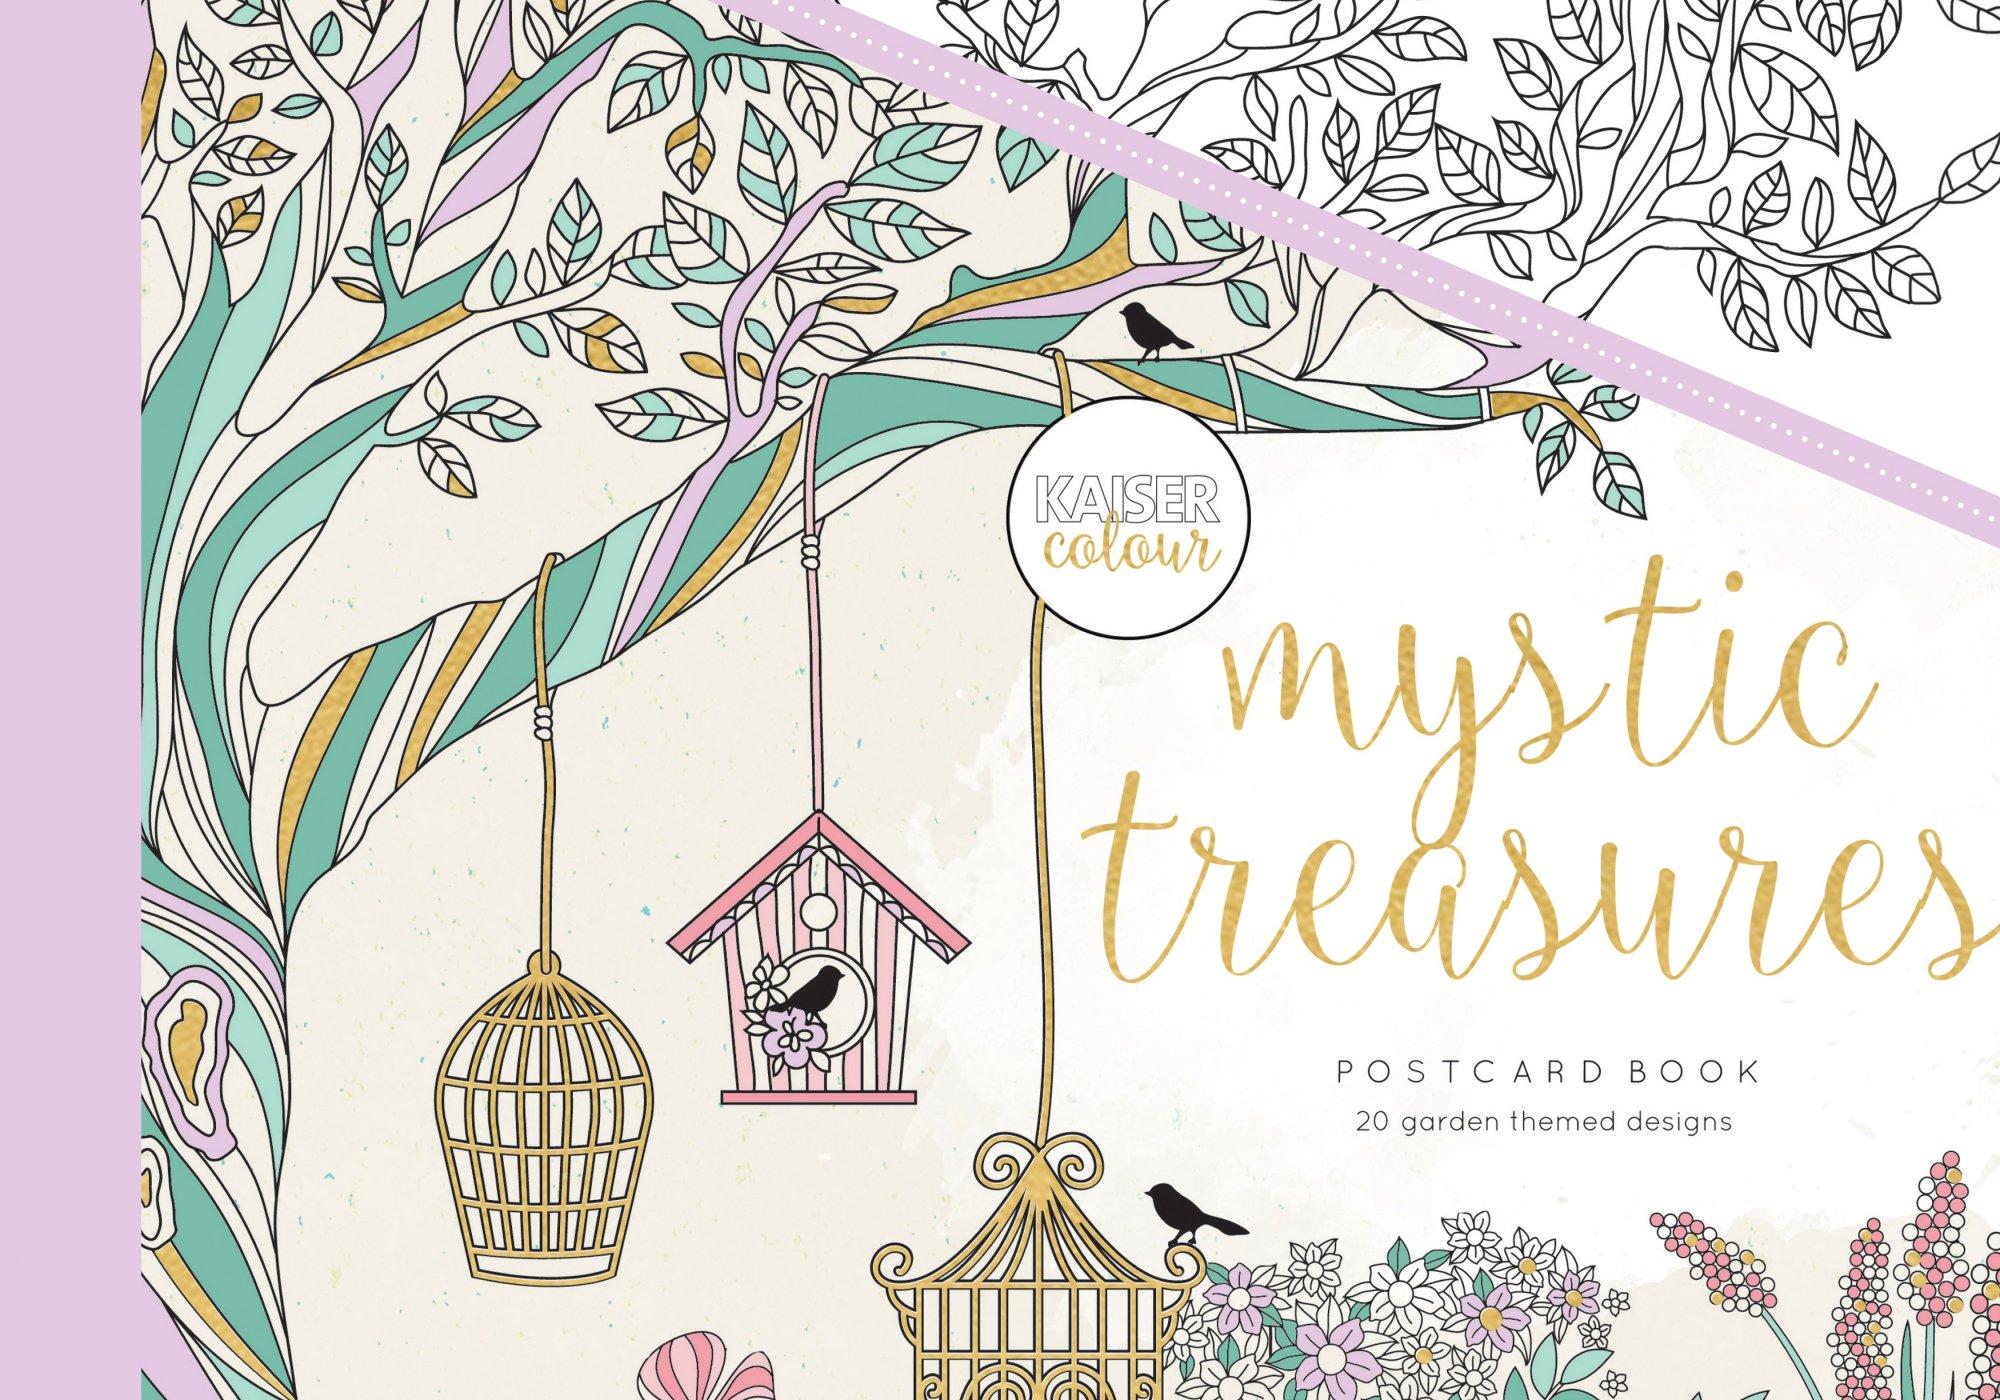 KaiserColour Postcard Book Mystic Treasures